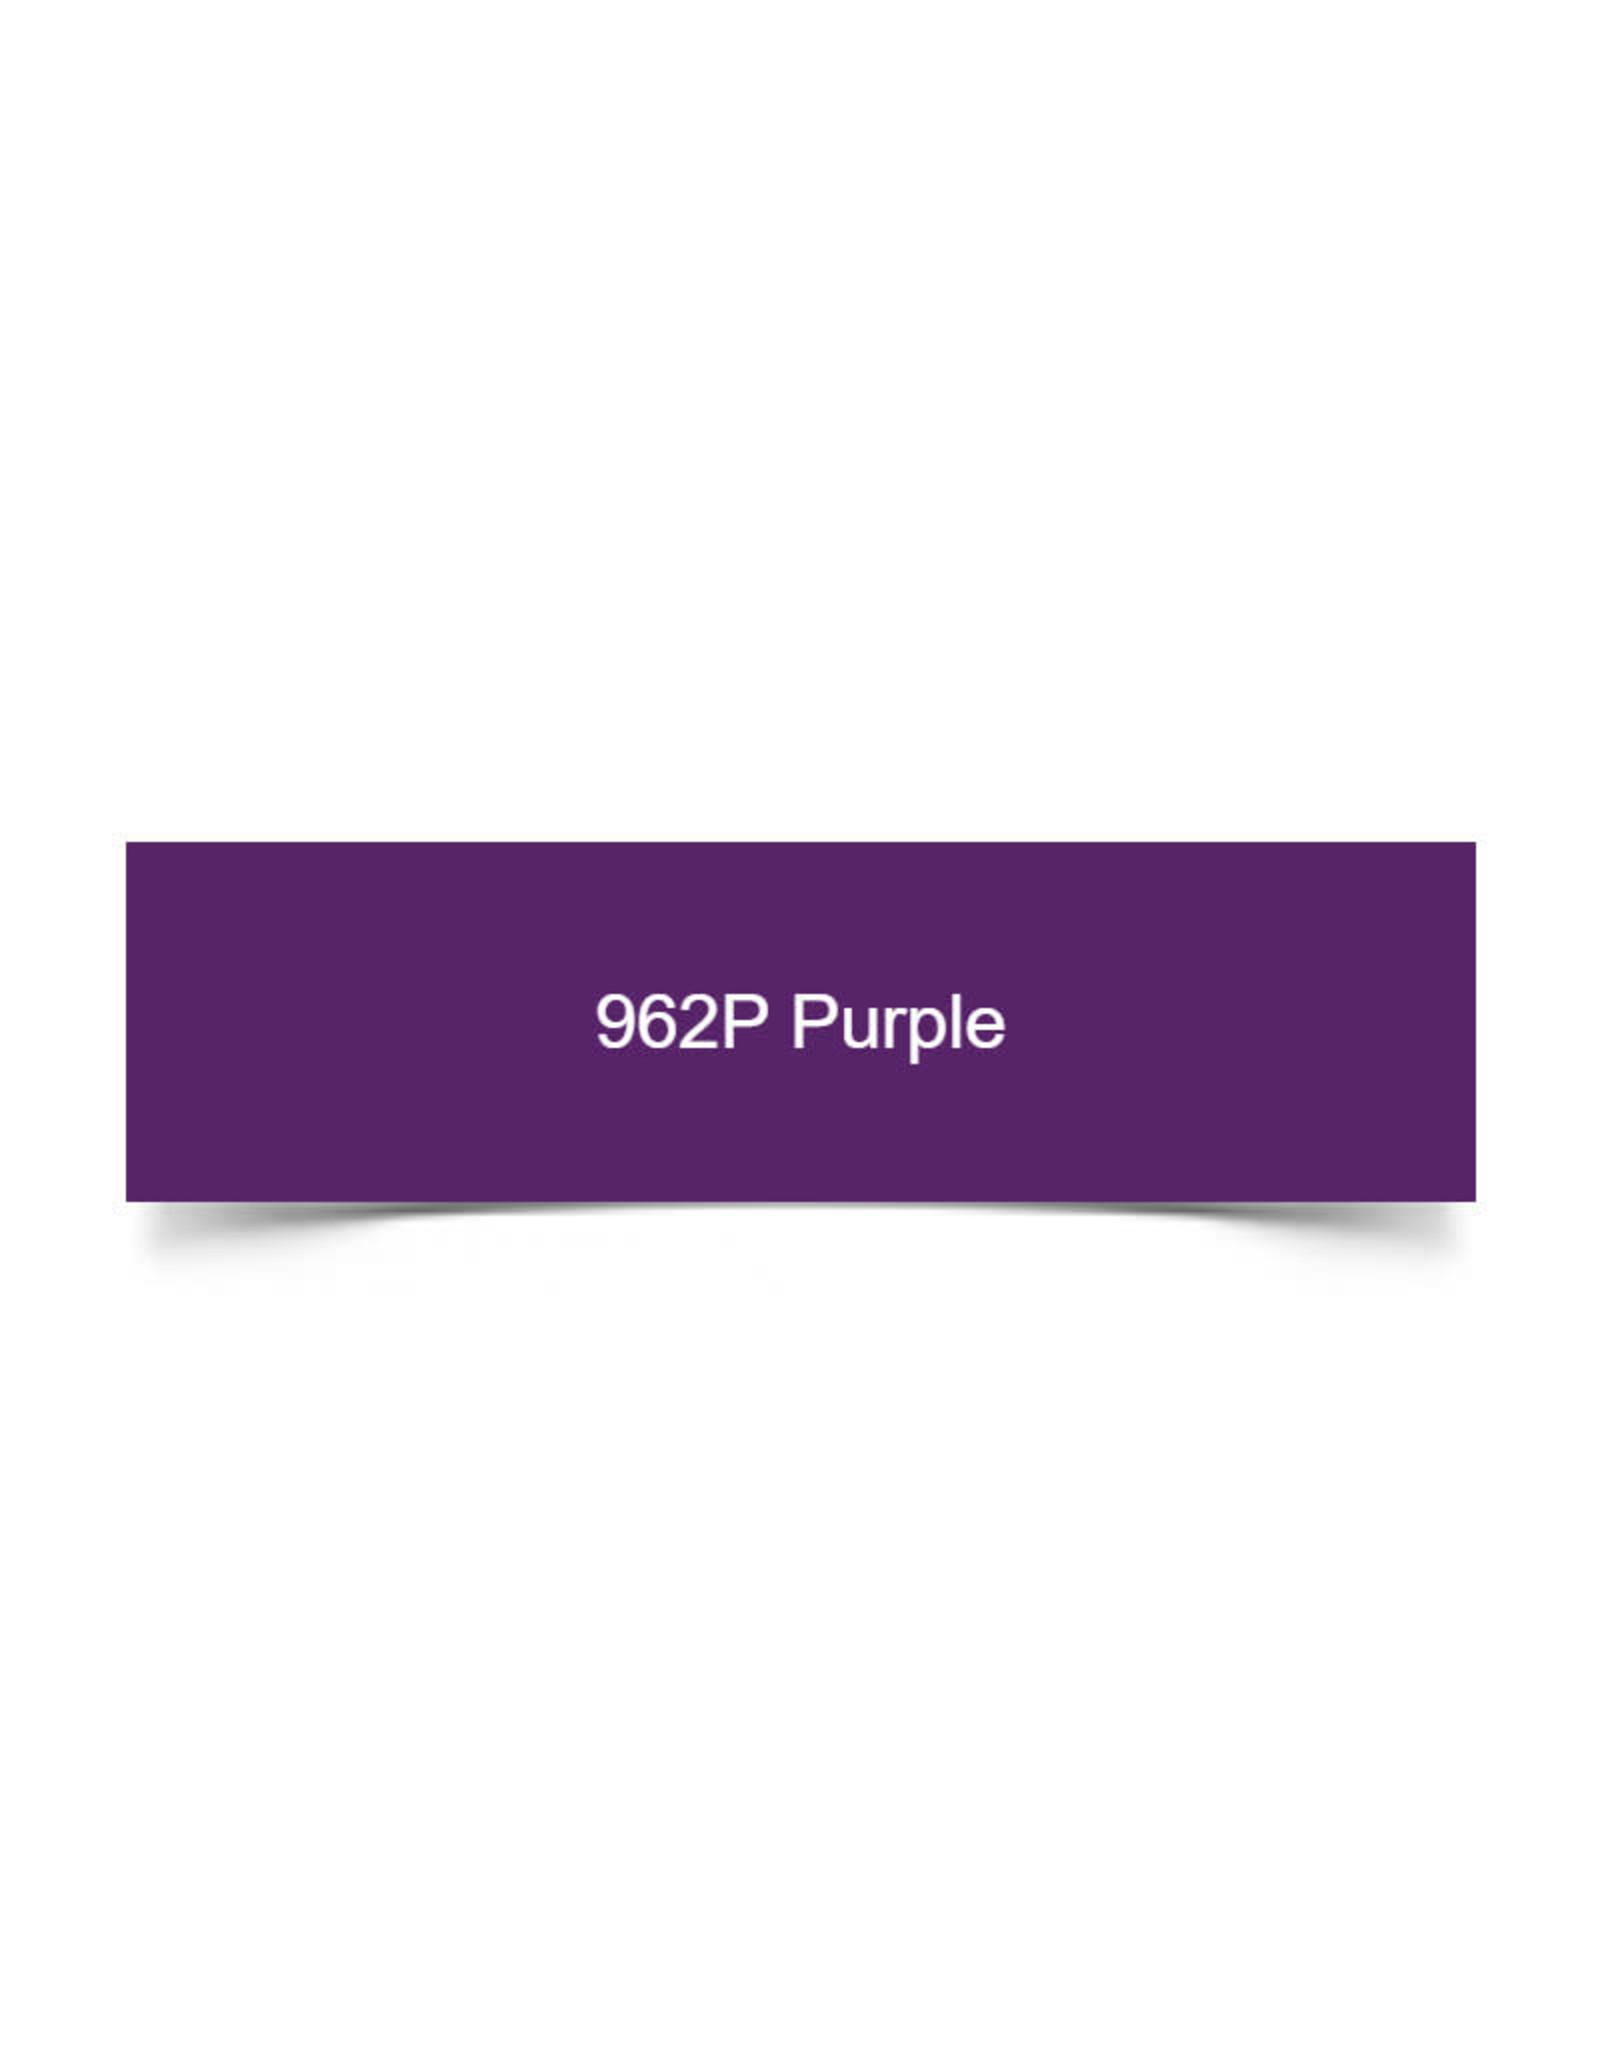 1 Shot 1 Shot Pearlescent Enamels 237 ml - 962P Purple